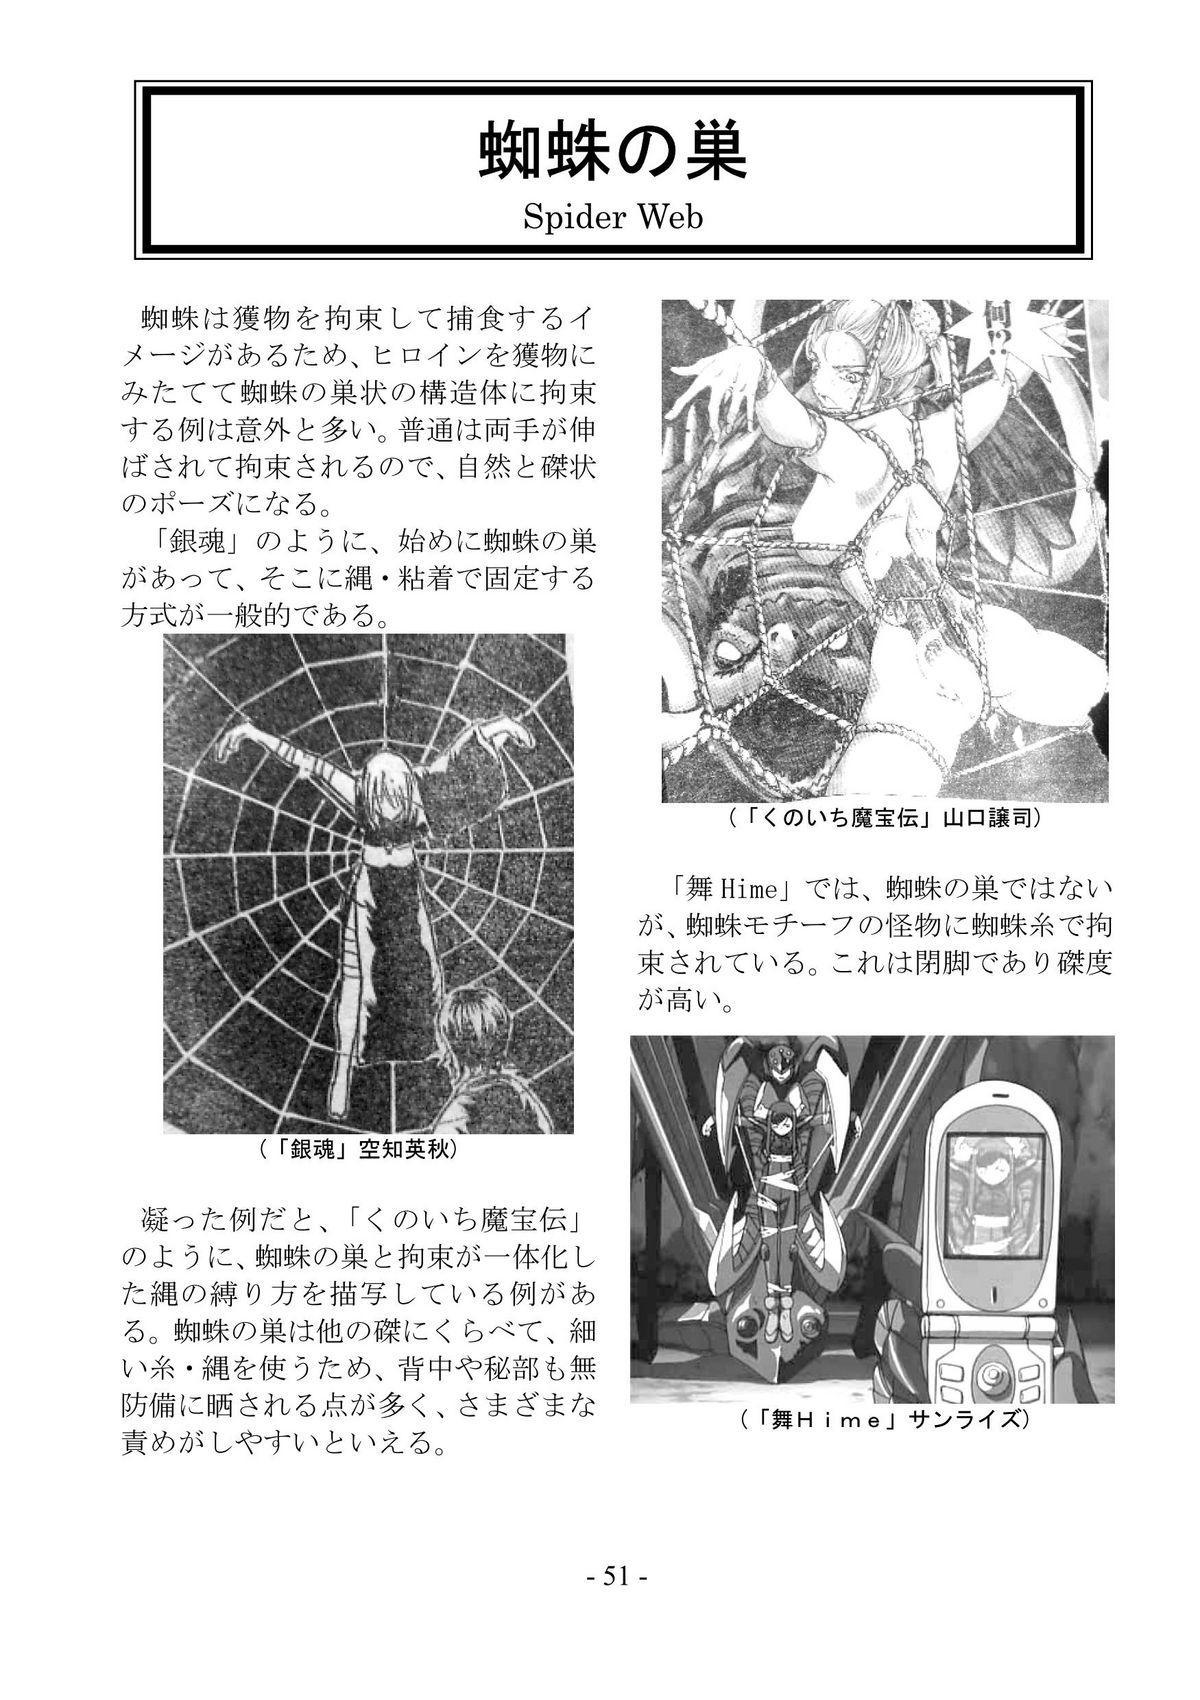 encyclopedia of crucifixion 51